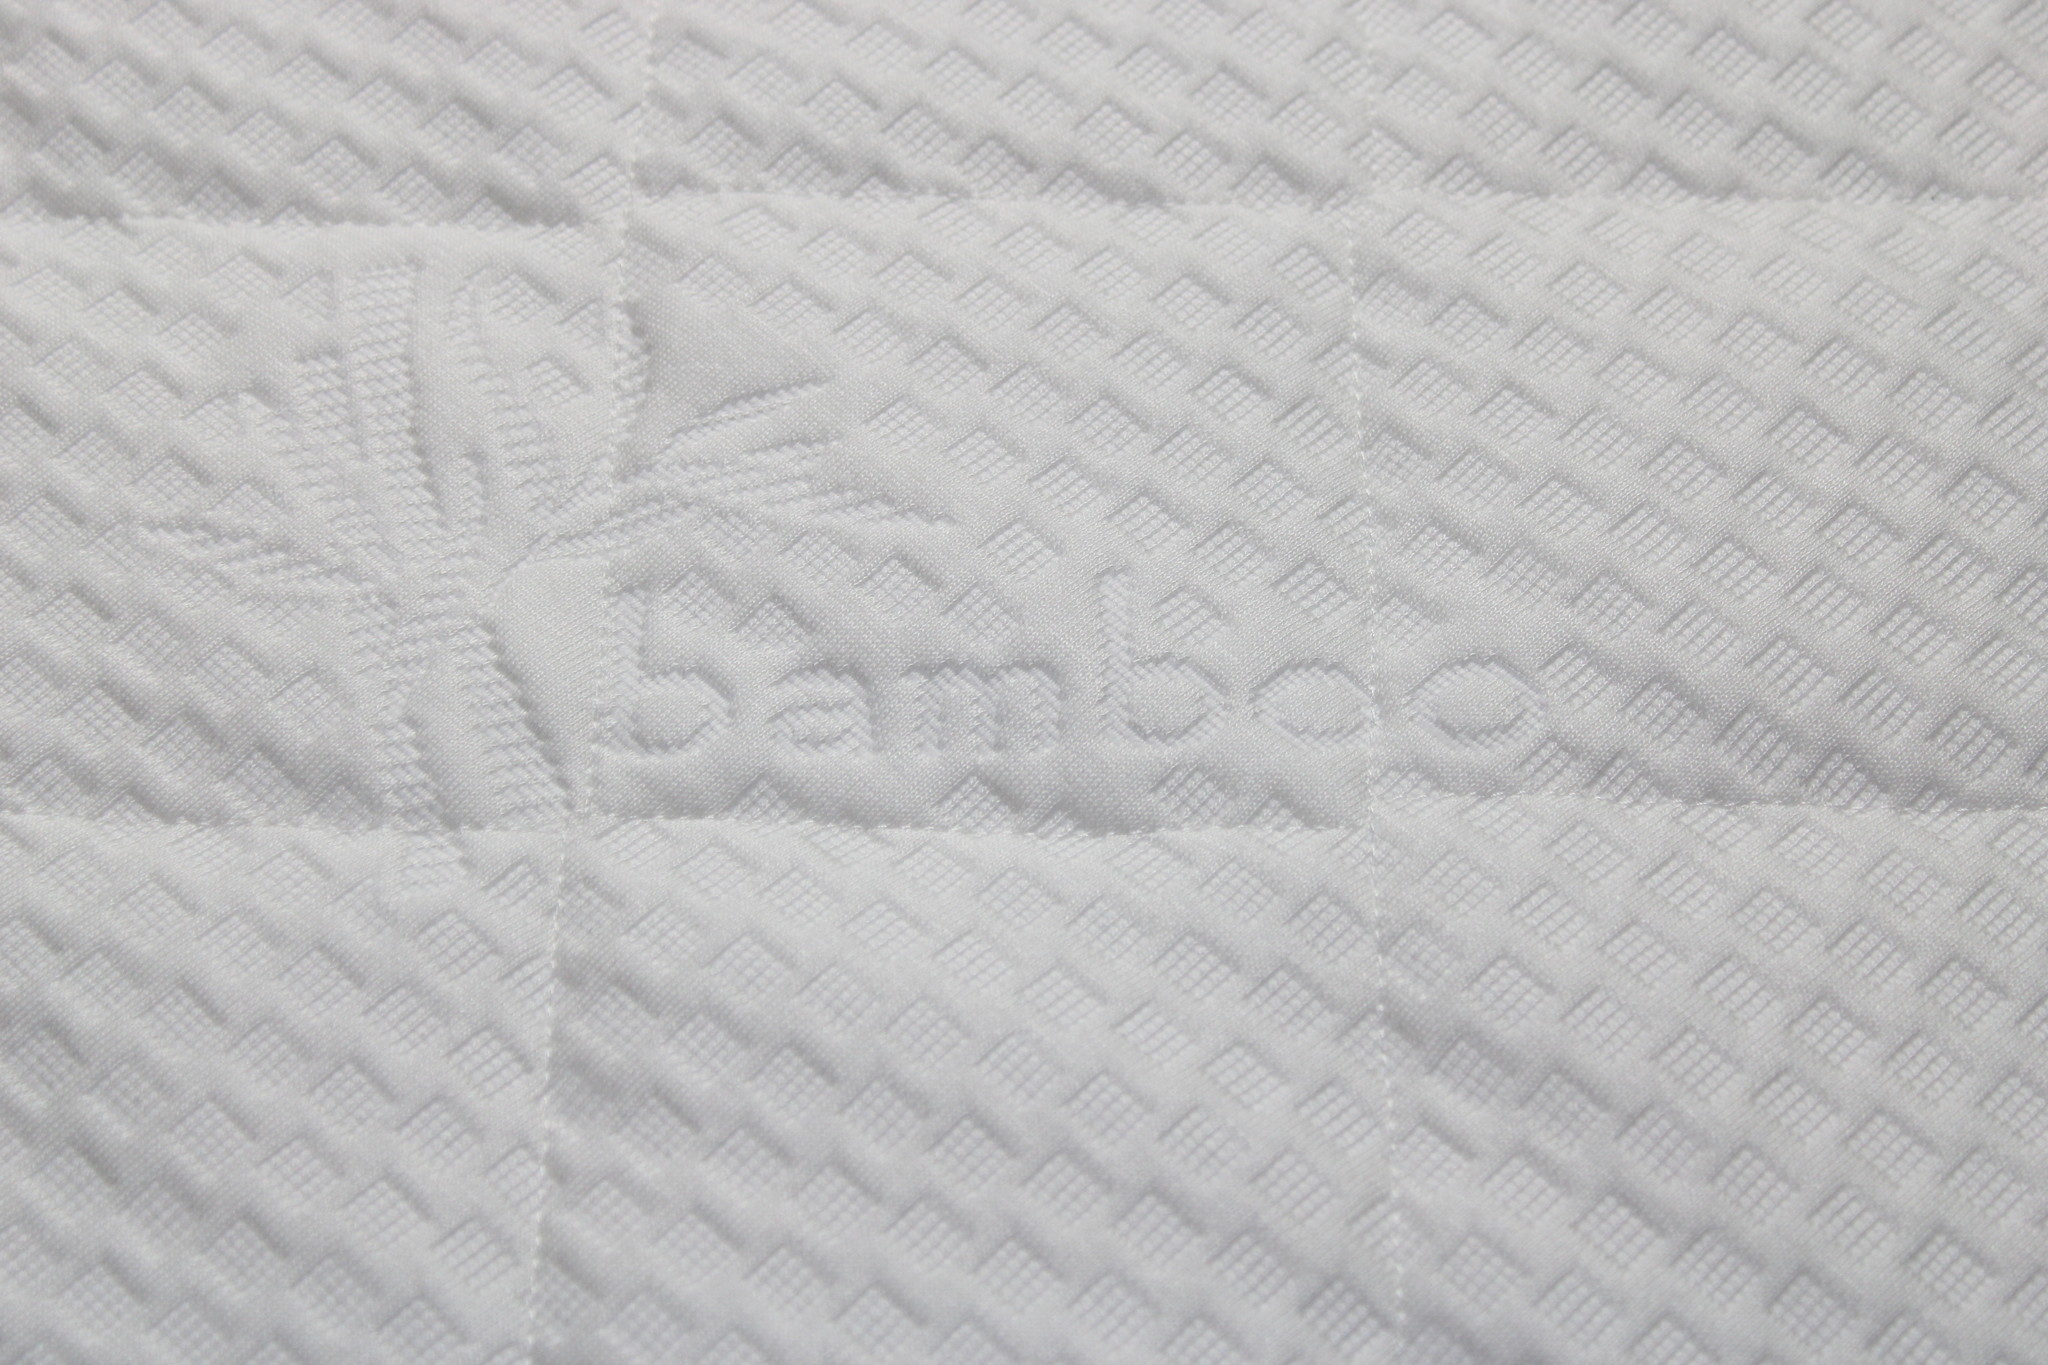 Sarpy Kindermatras 90x170 koudschuim HR55 bamboo